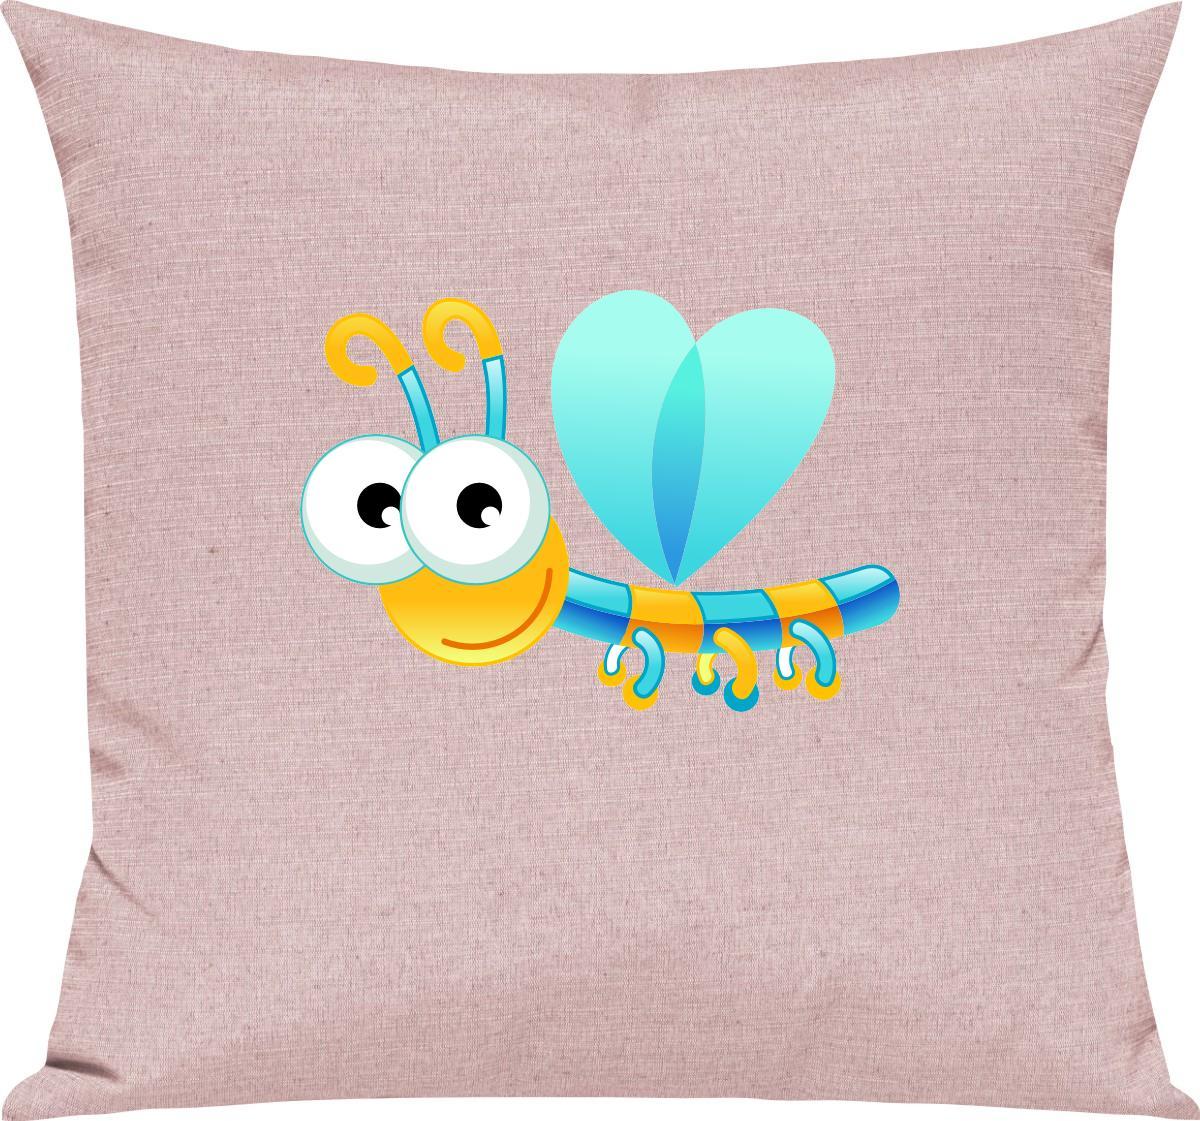 Indexbild 12 - Kinder Kissen, Libelle Insekt Tiere Tier Natur, Kuschelkissen Couch Deko,